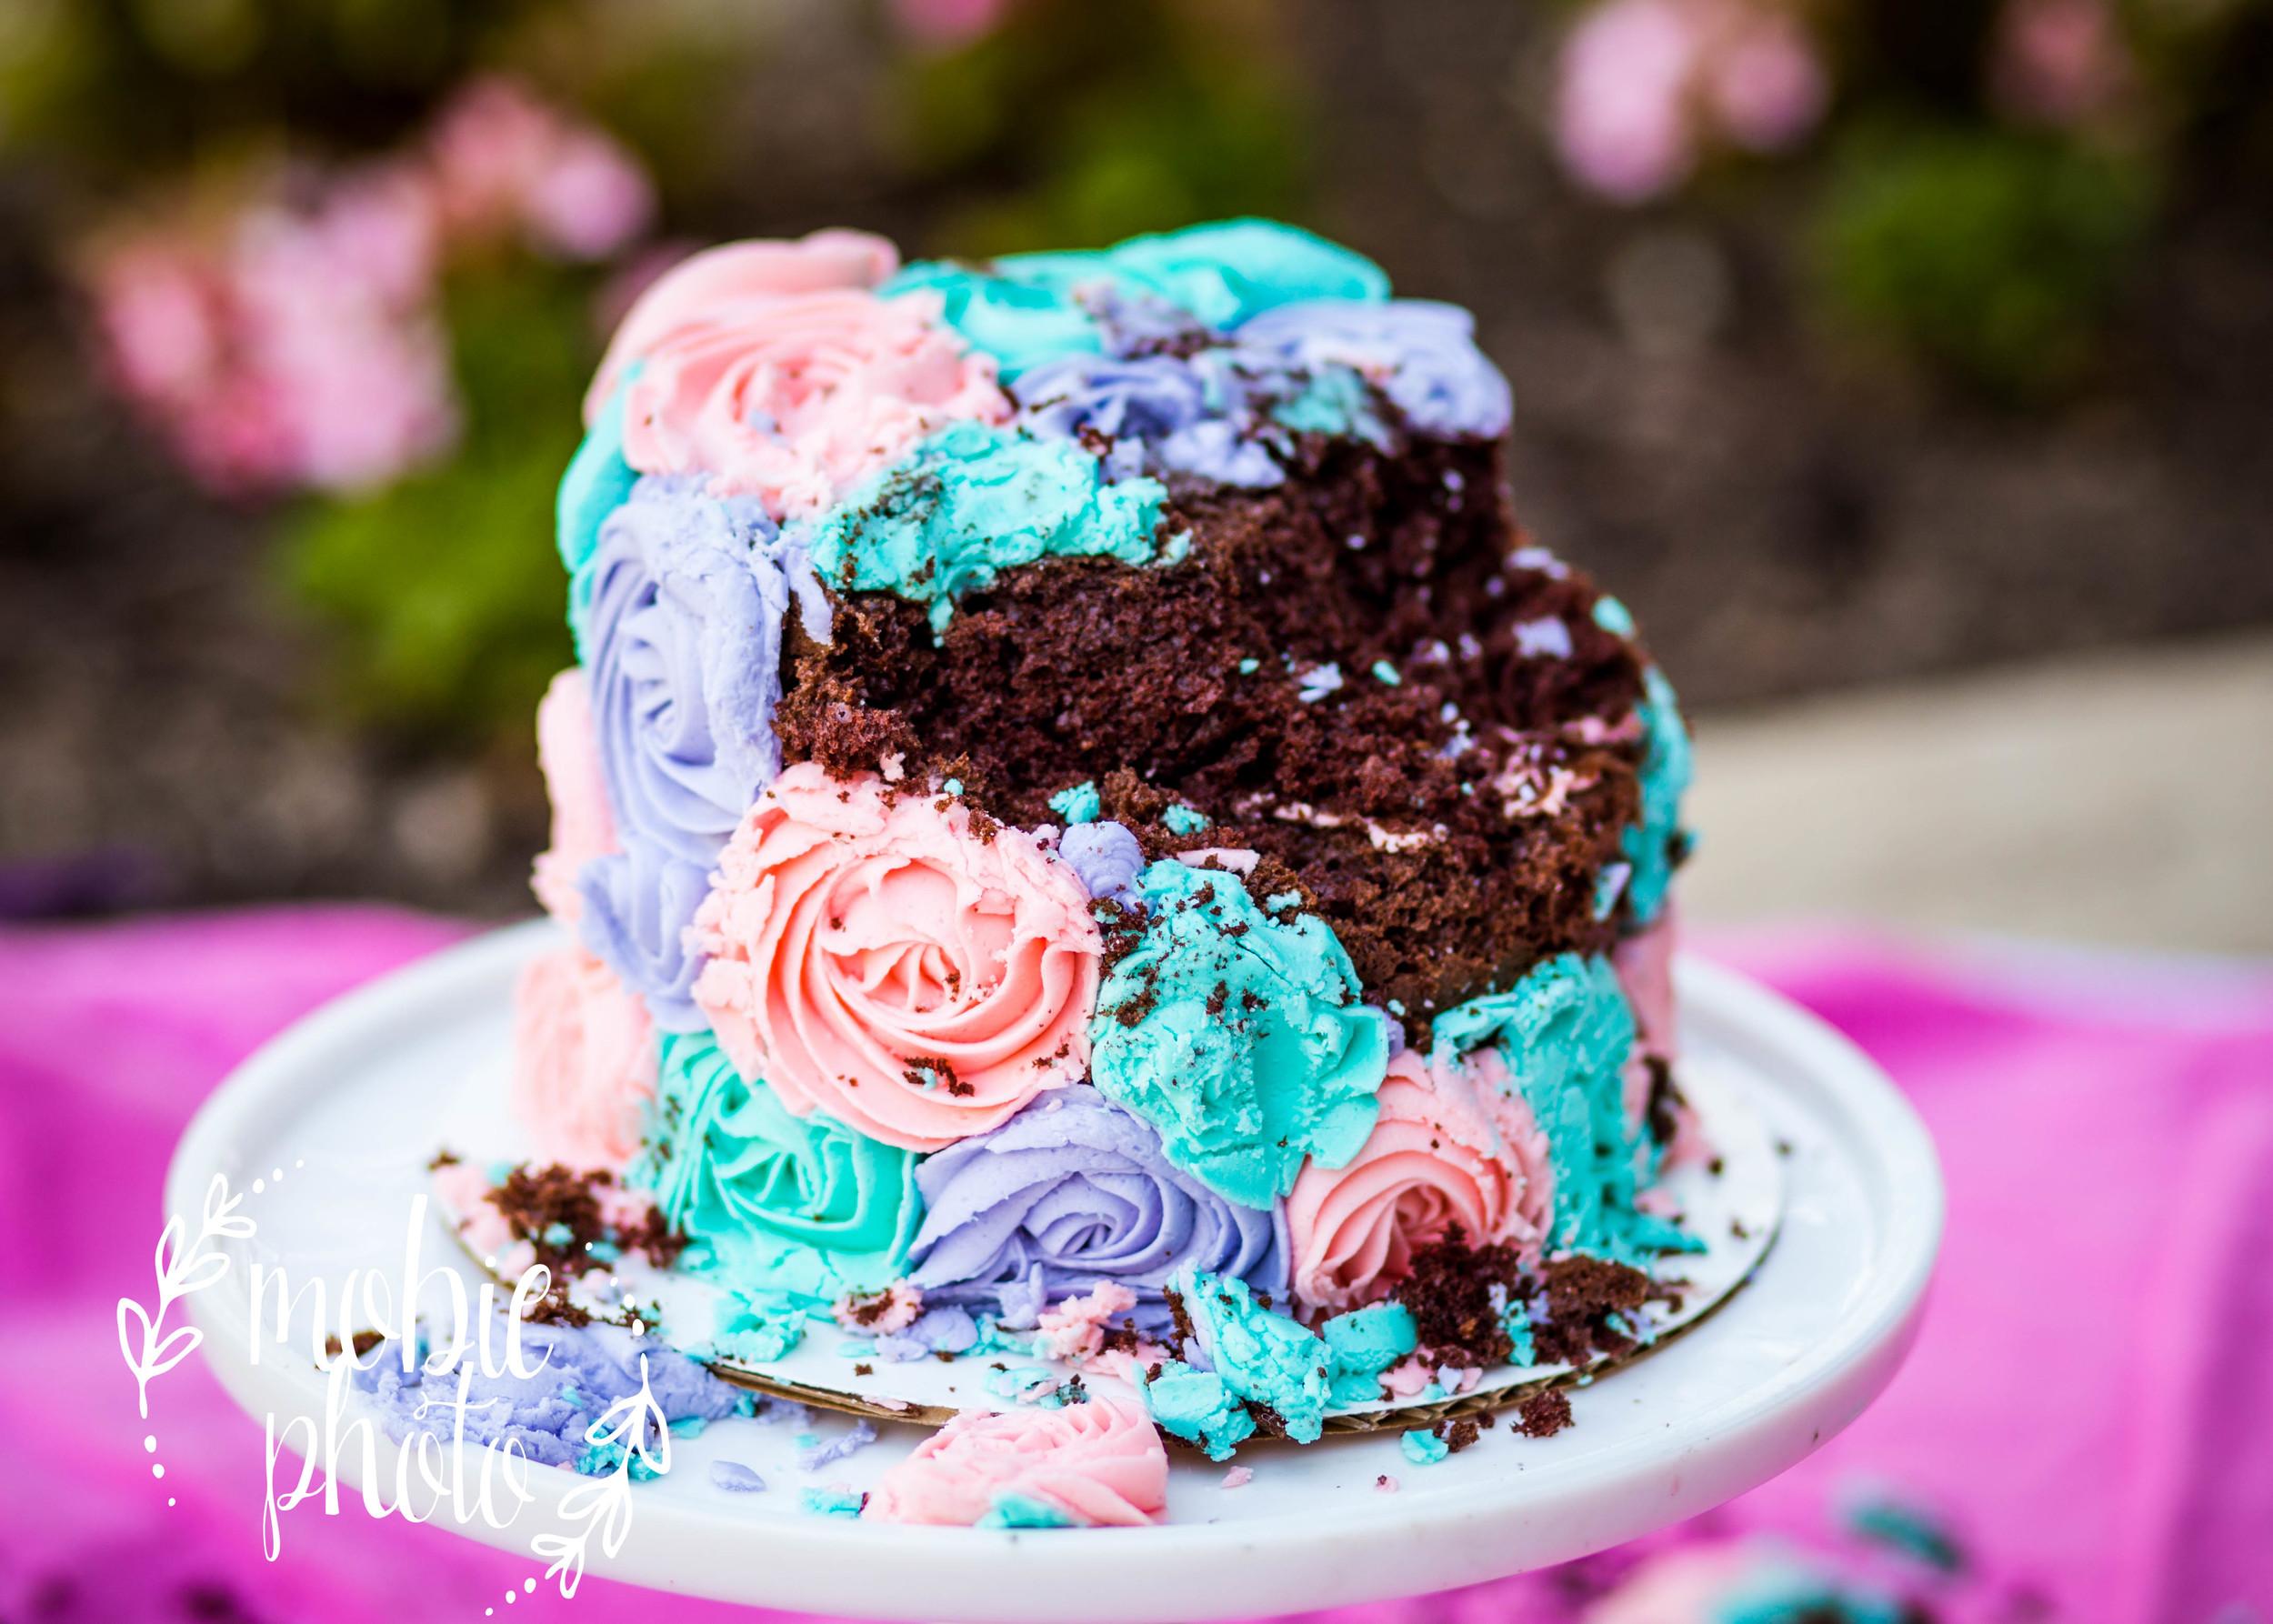 1st Year Photography - Lehi, Utah - Outdoor Cake Smash